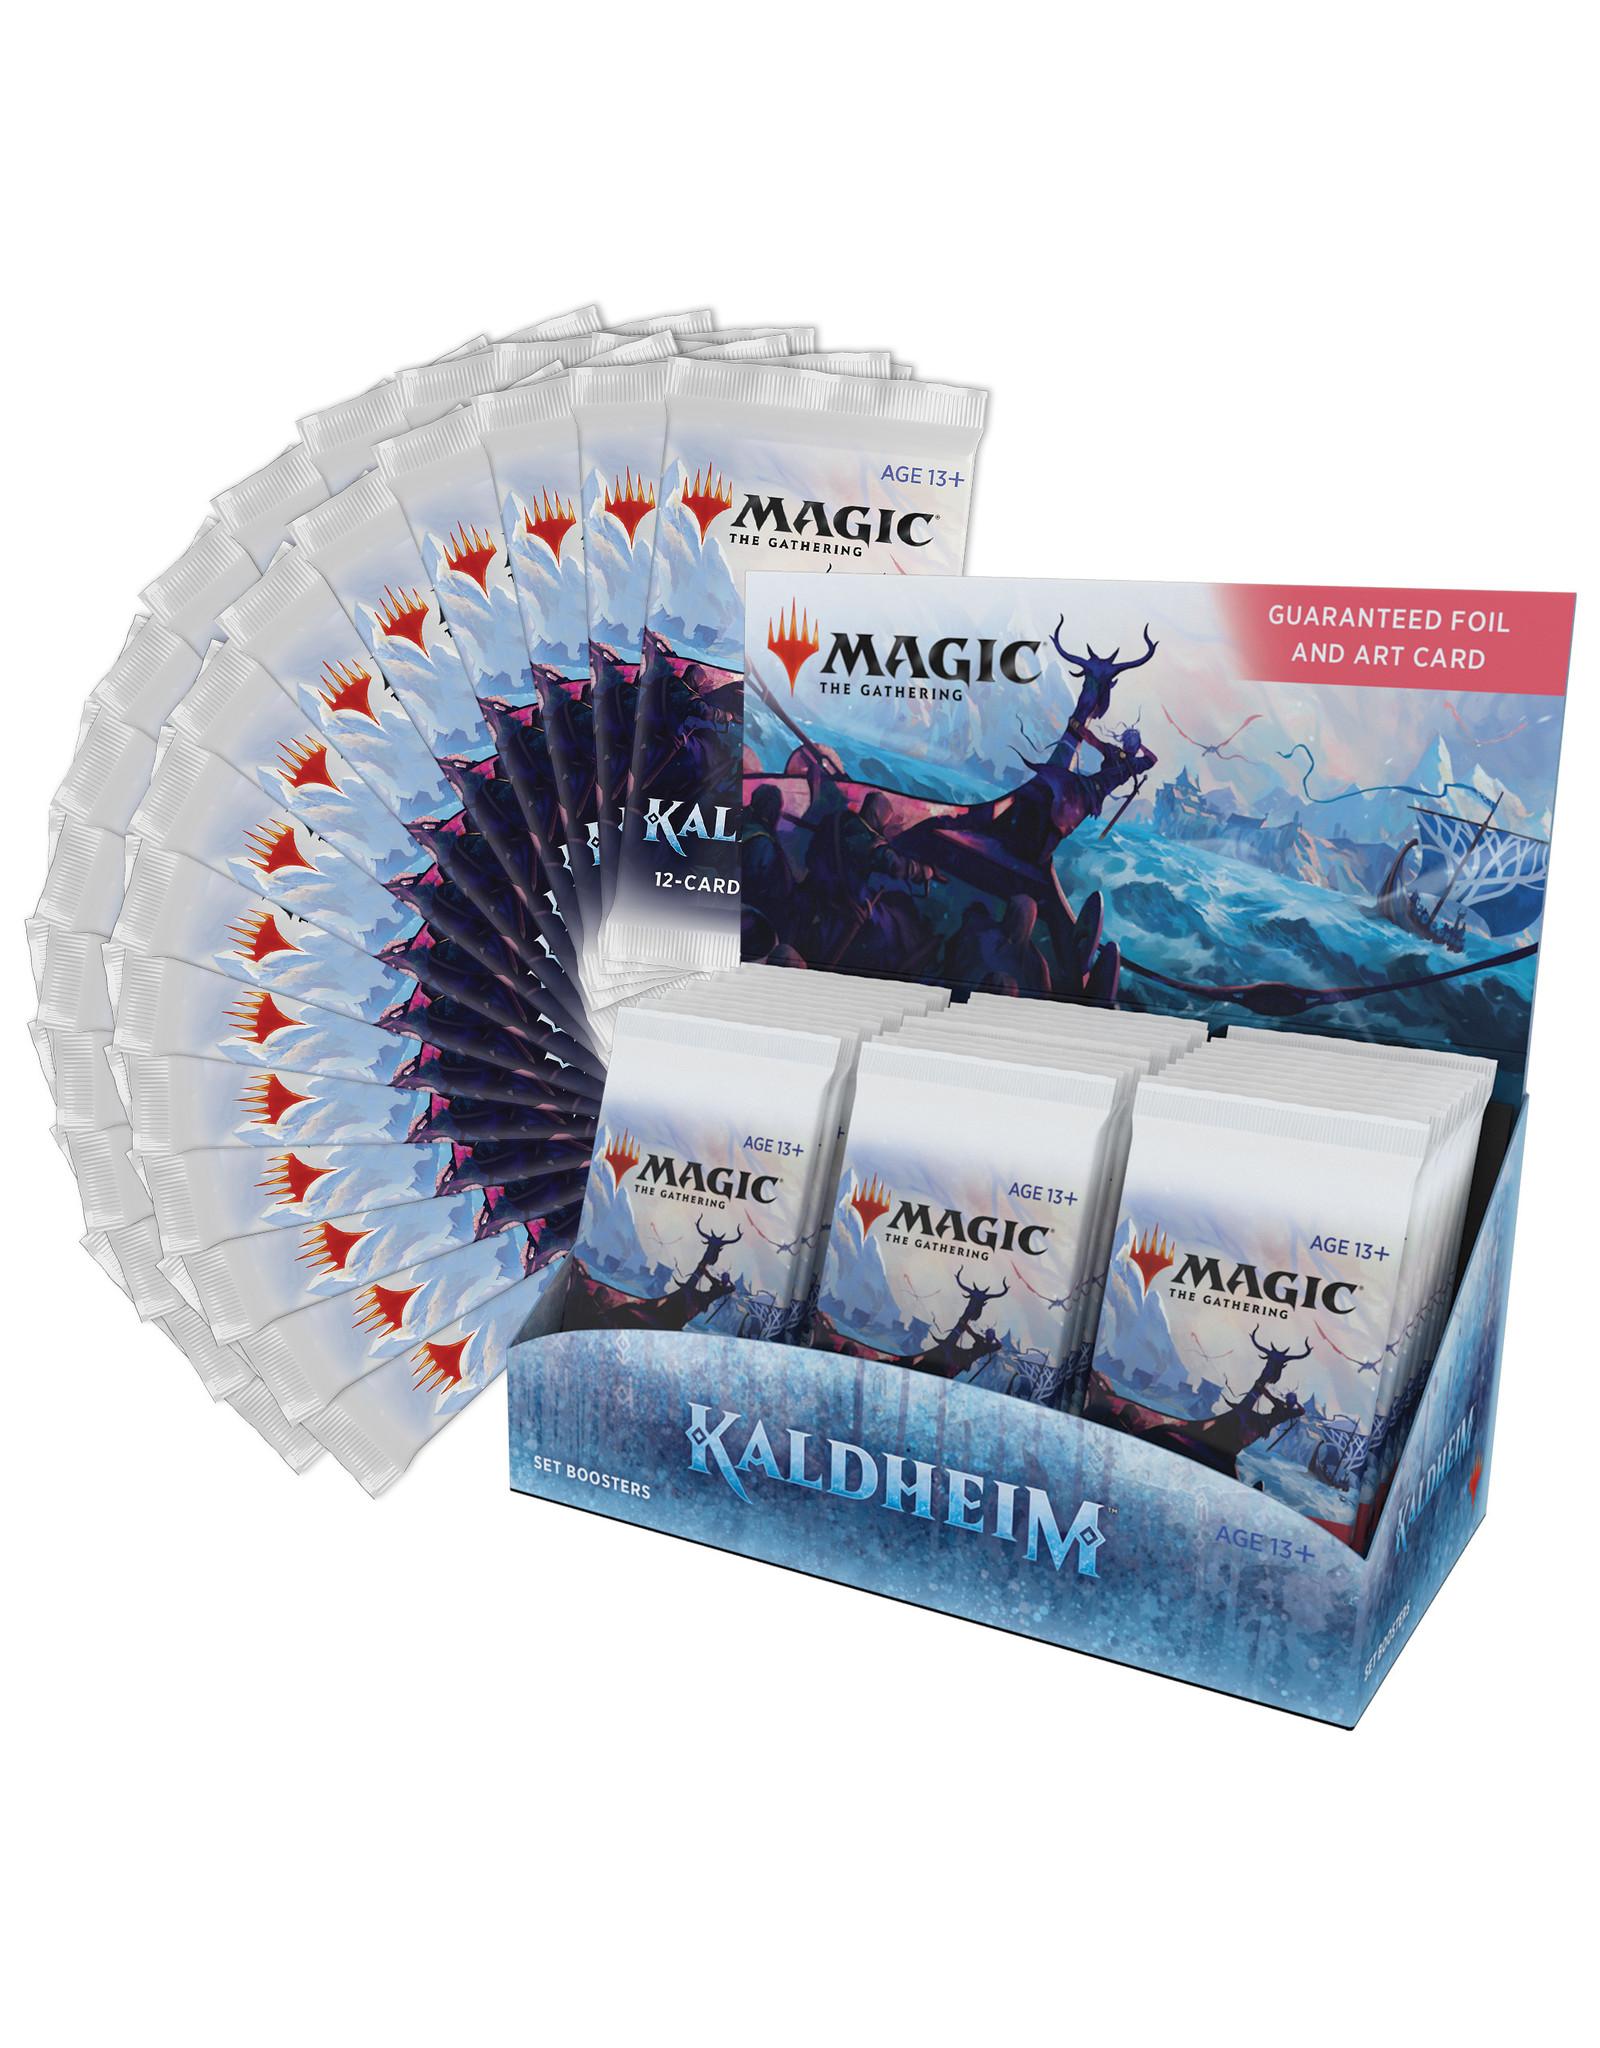 Magic Magic The Gathering: Kaldheim Set Booster Box (30Ct)